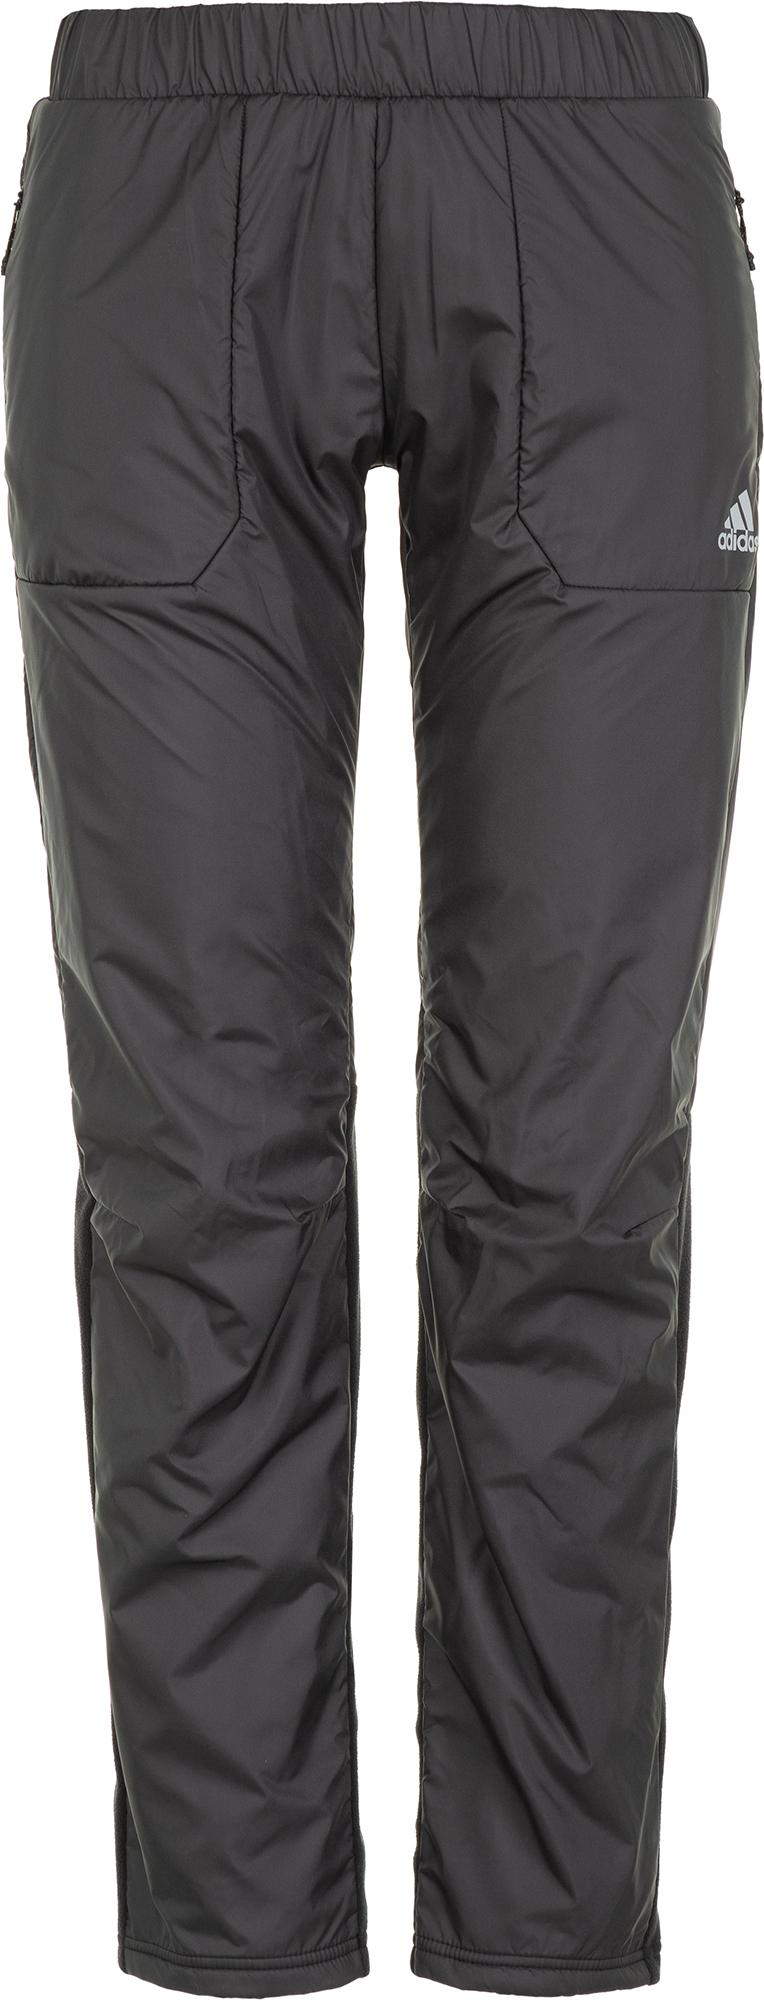 Adidas Брюки утепленные женские Windfleece, размер 54-56